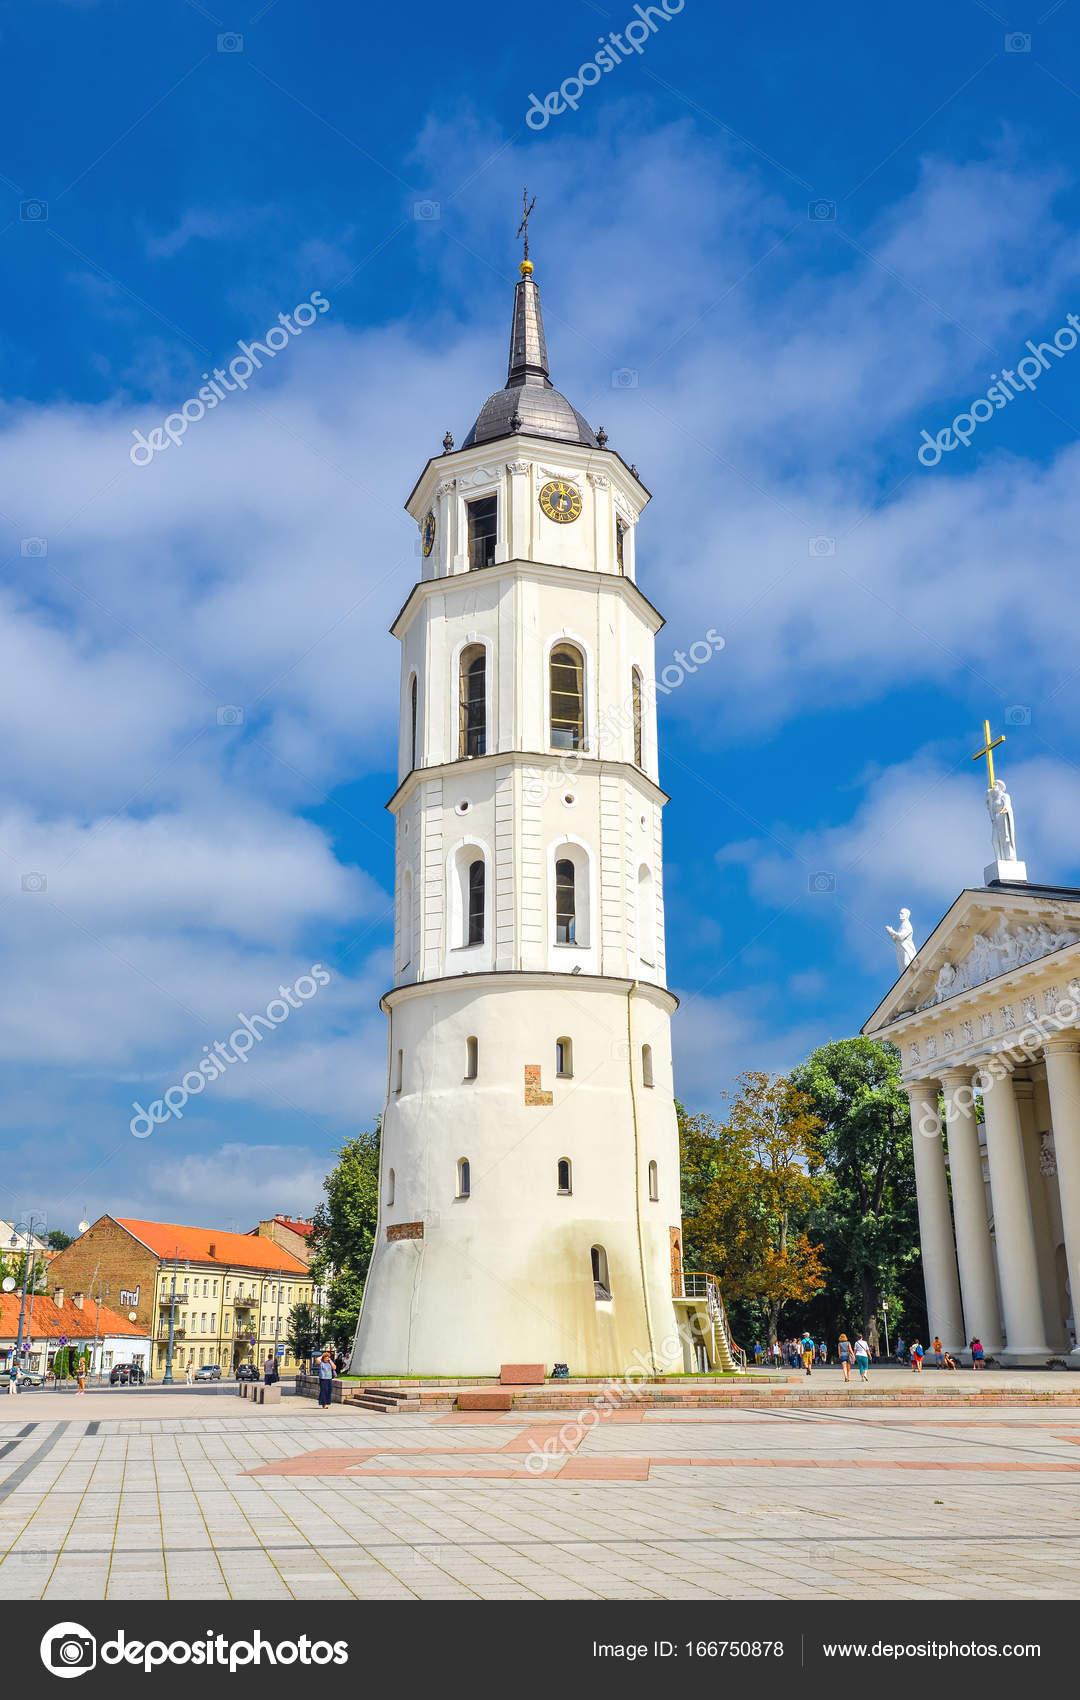 480d028d1d7 ... Όμορφο καμπαναριό και Βίλνιους Βασιλική καθεδρικό ναό των Αγίων  Stanislaus και Βλαδίσλαου β και το φωτεινό μπλε ουρανό, σύννεφα, Βίλνιους  Λιθουανίας.